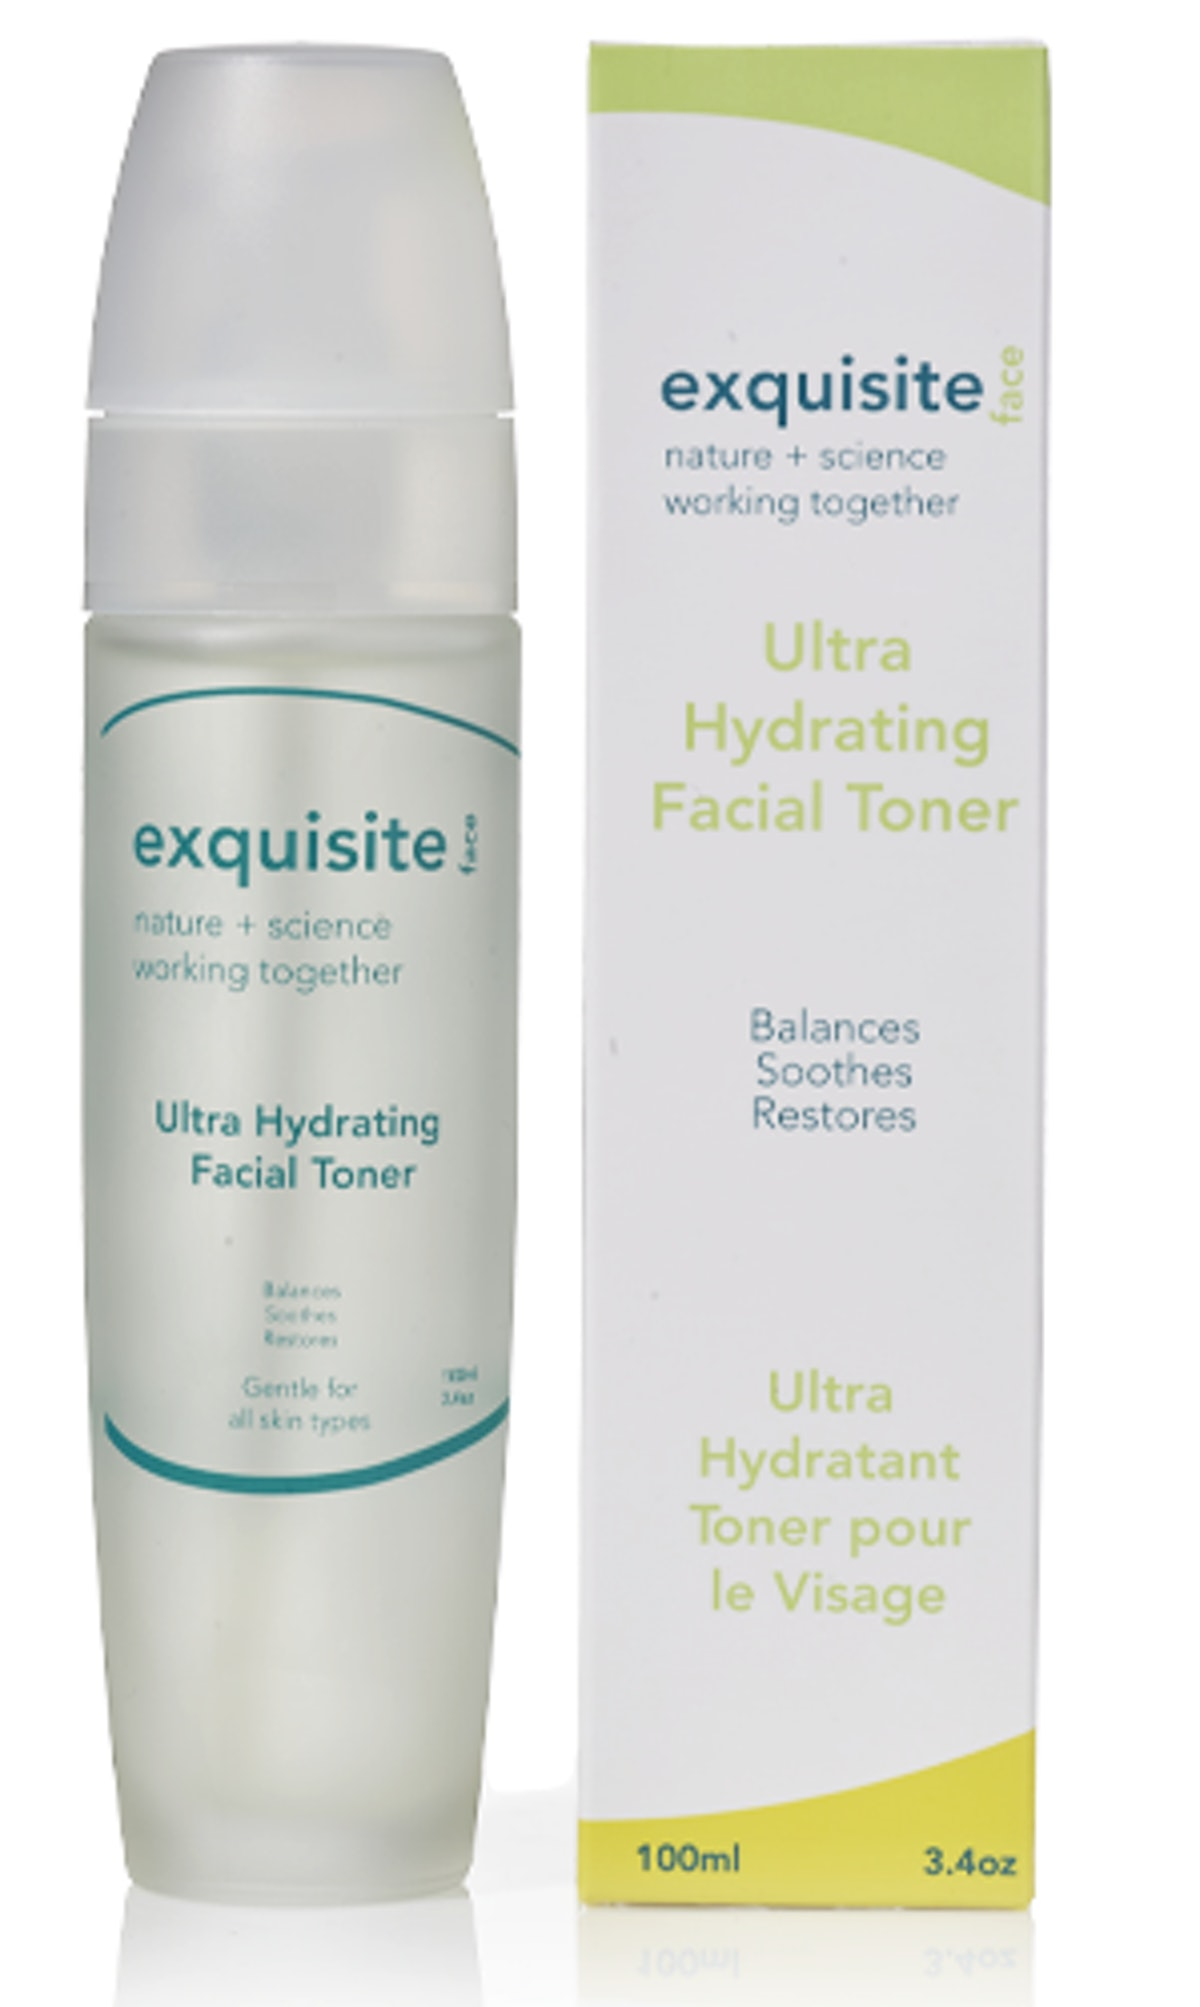 Ultra Hydrating Facial Toner